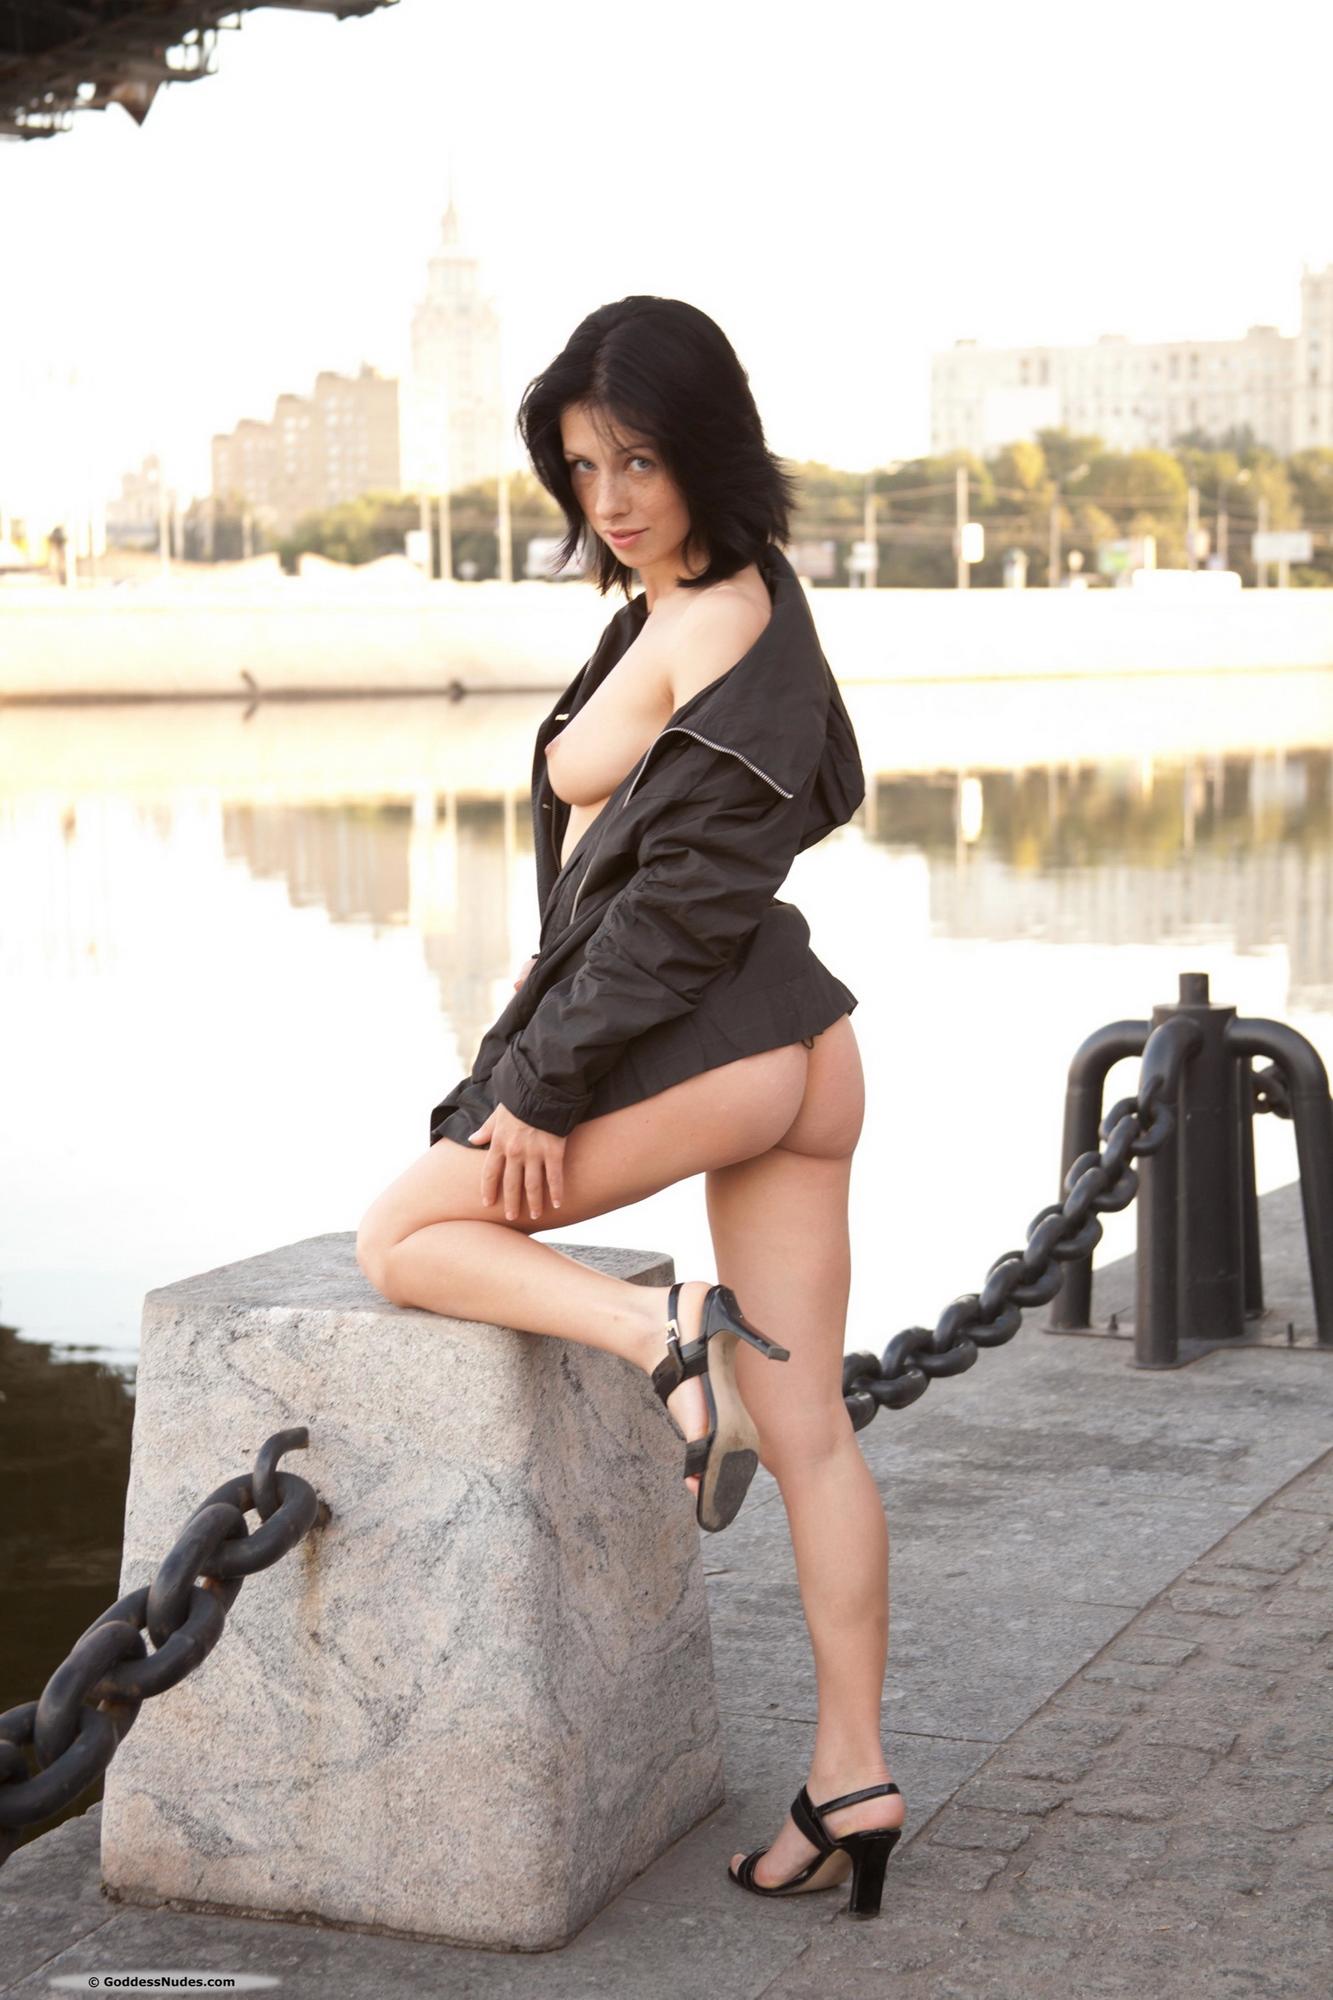 hellena-brunette-freckles-nude-moscow-goddessnudes-06